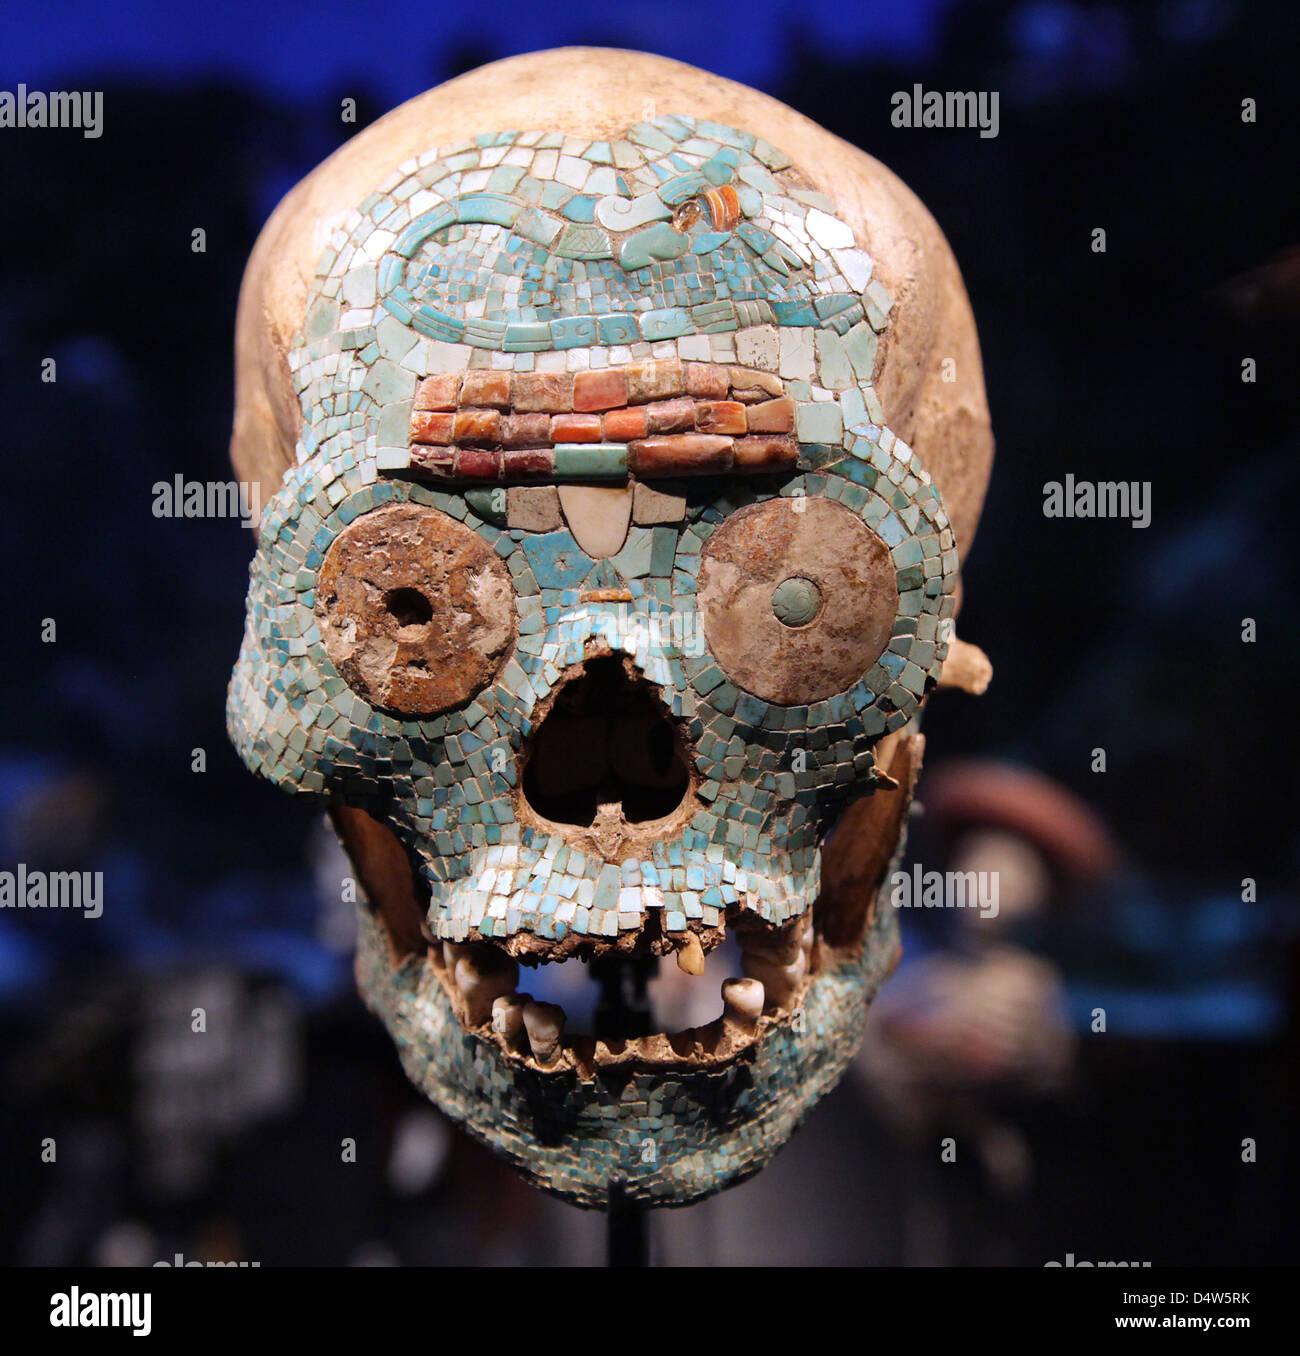 Skull.Mosaic.Mexico.Dia de Los Muertos.day der Toten. Cultural Anthropology. Stockbild